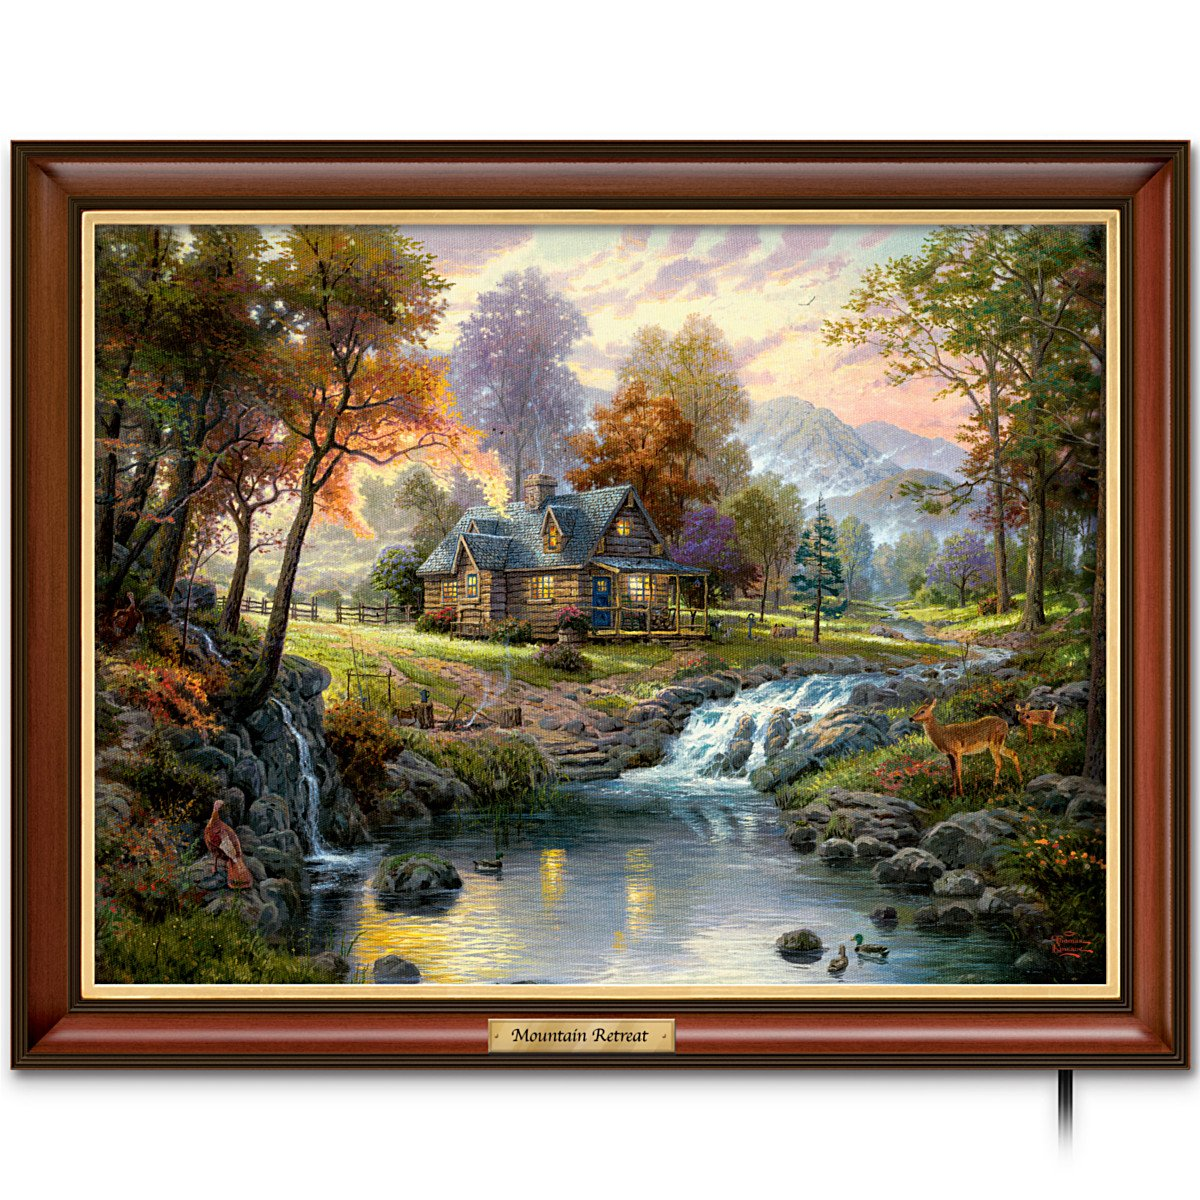 Amazon.com: Thomas Kinkade Canvas Print Wall Decor: Mountain Retreat ...